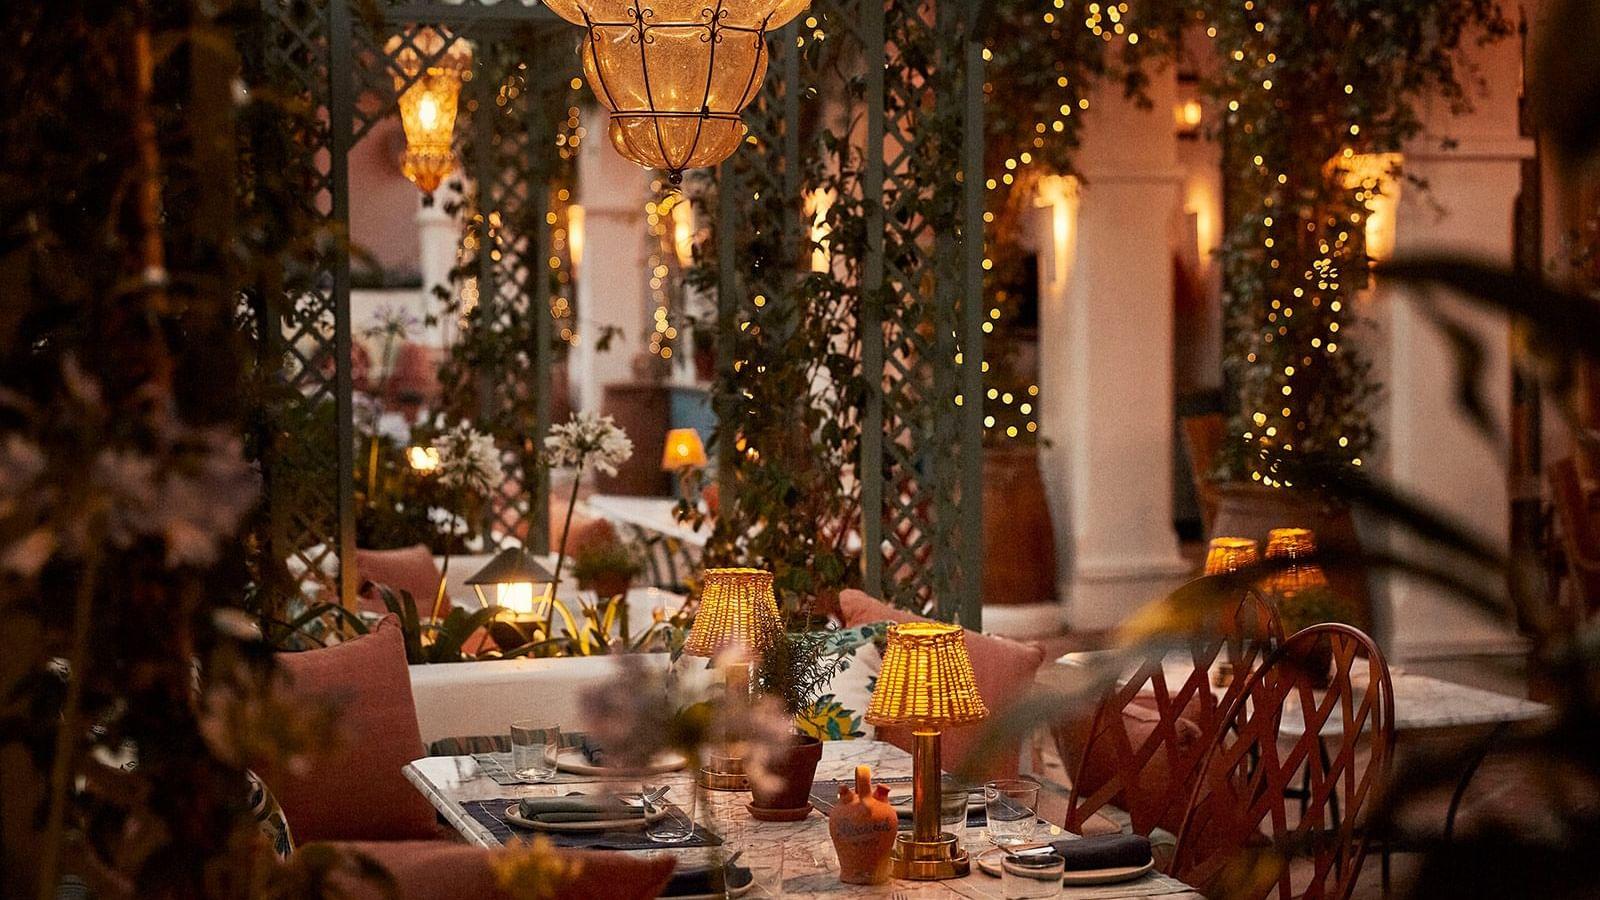 El Patio Restaurant by night at Marbella Club Hotel